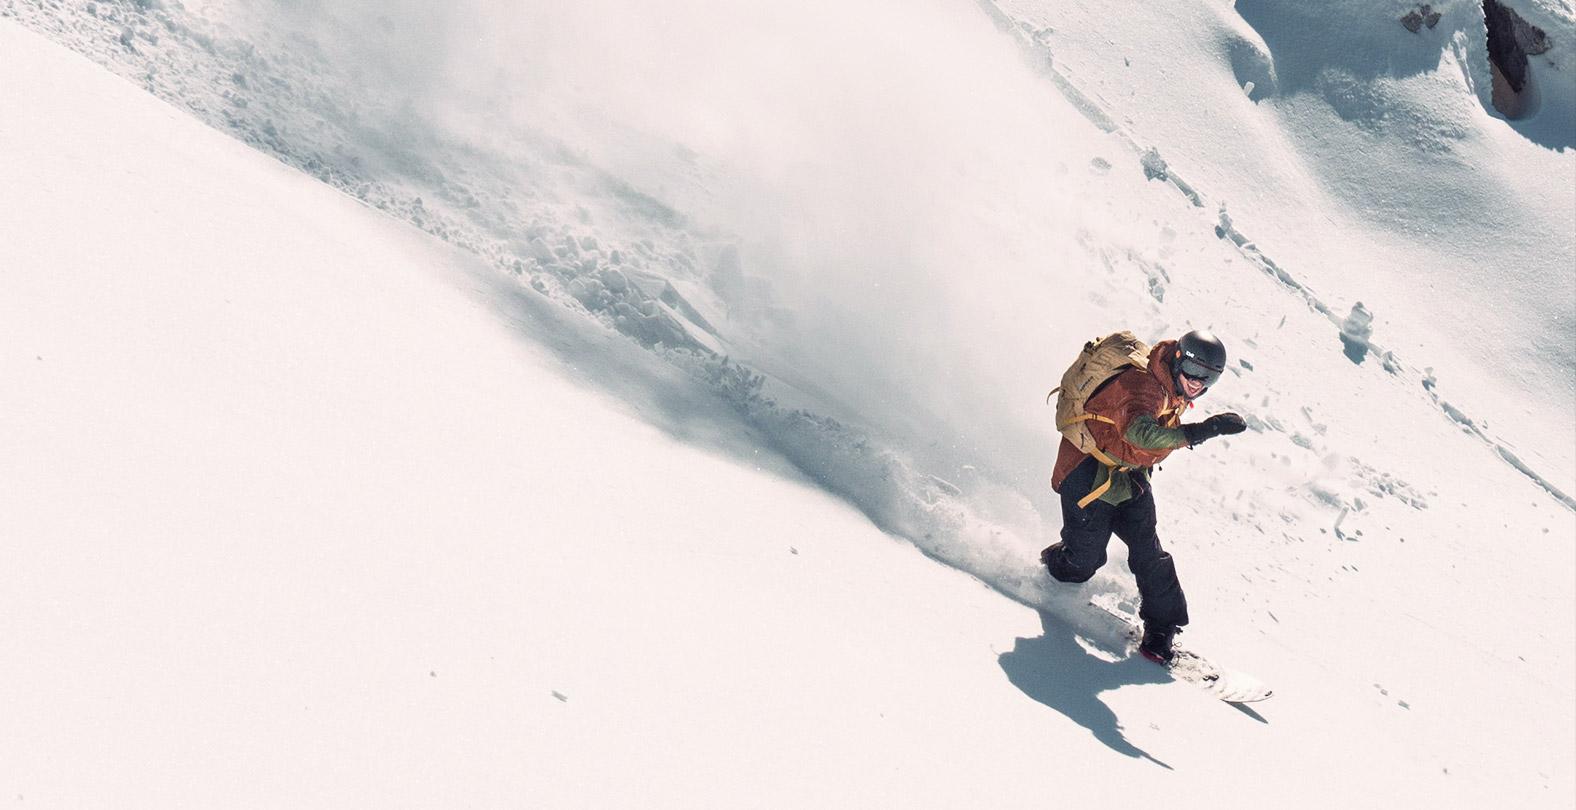 Gigi Ruef snowboarding powspray smile